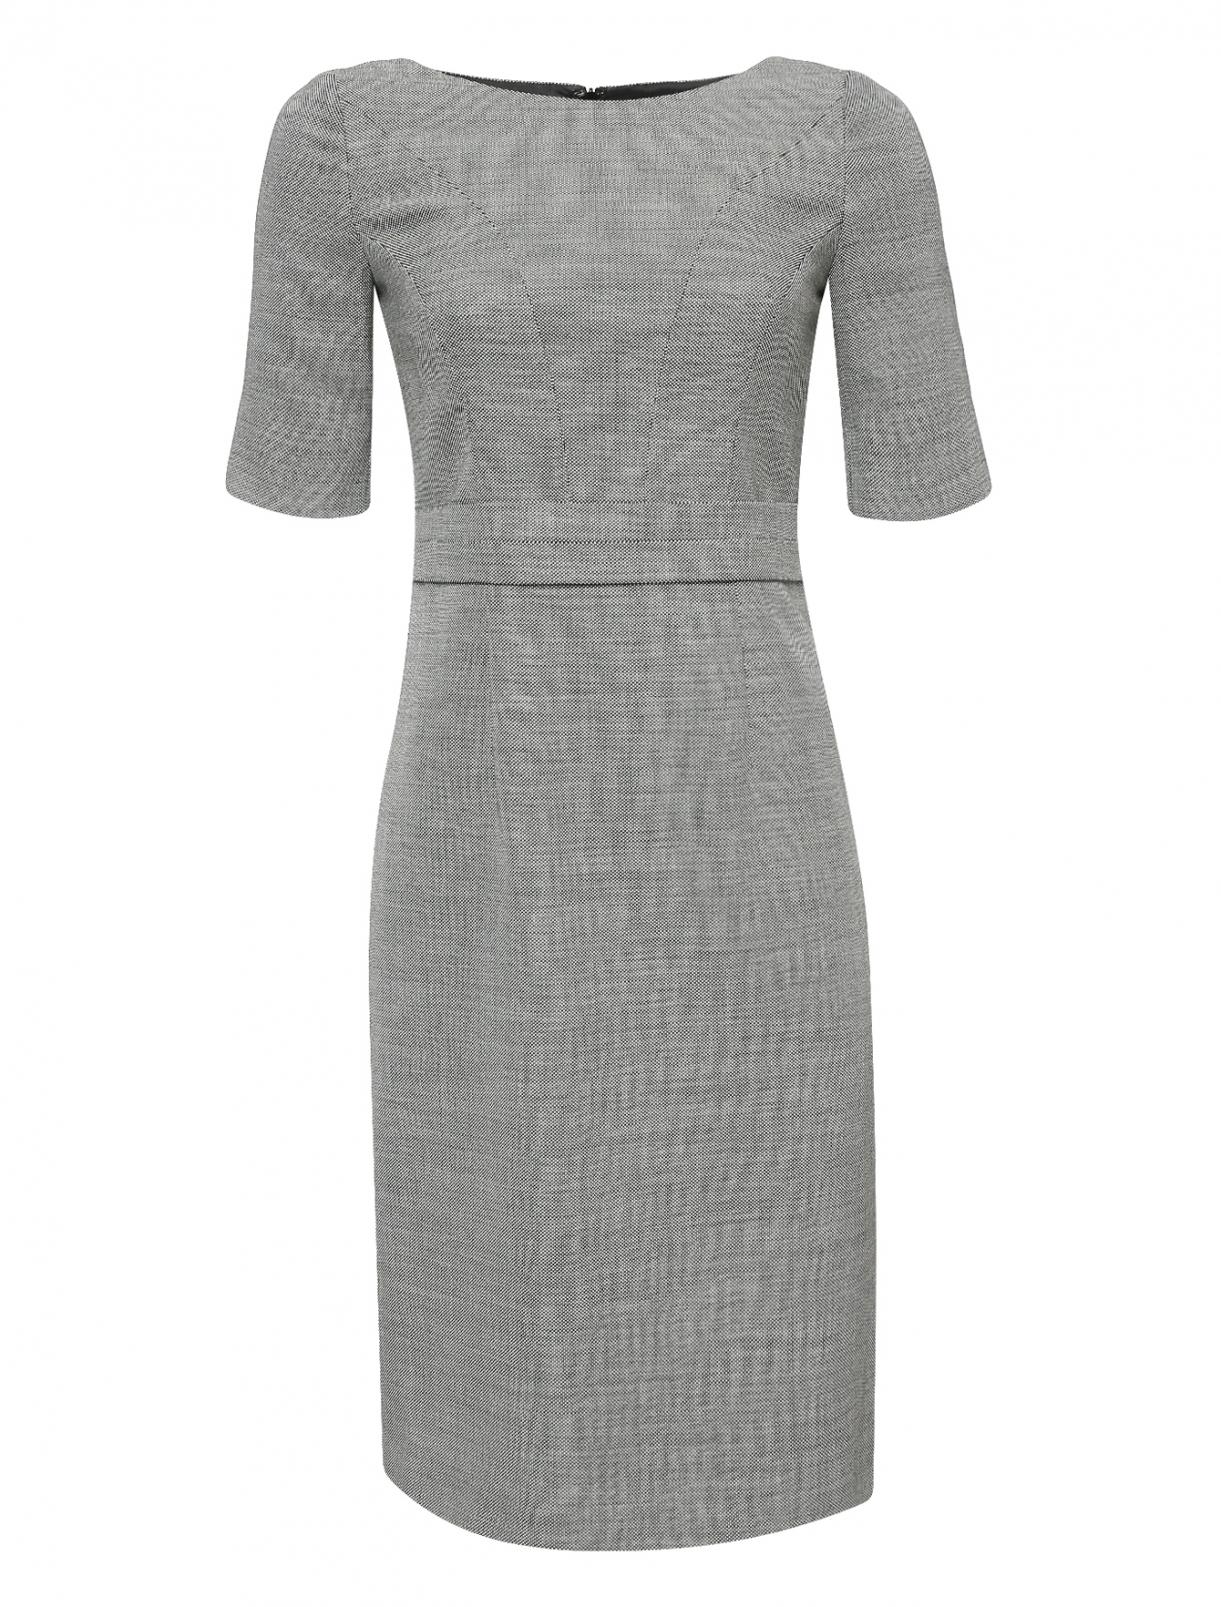 Платье-футляр из шерсти с короткими рукавами Brooks Brothers  –  Общий вид